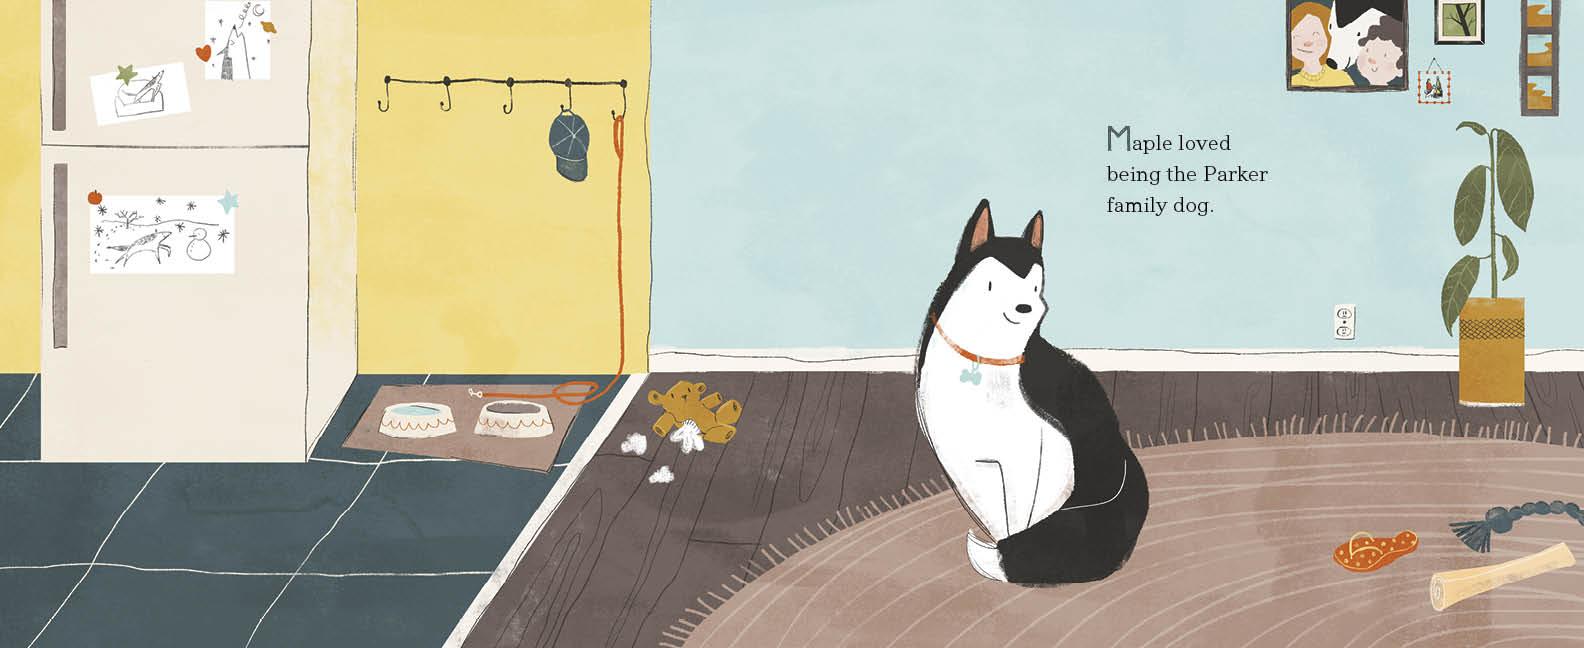 celebrate-picture-books-picture-book-review-lone-wolf-Maple